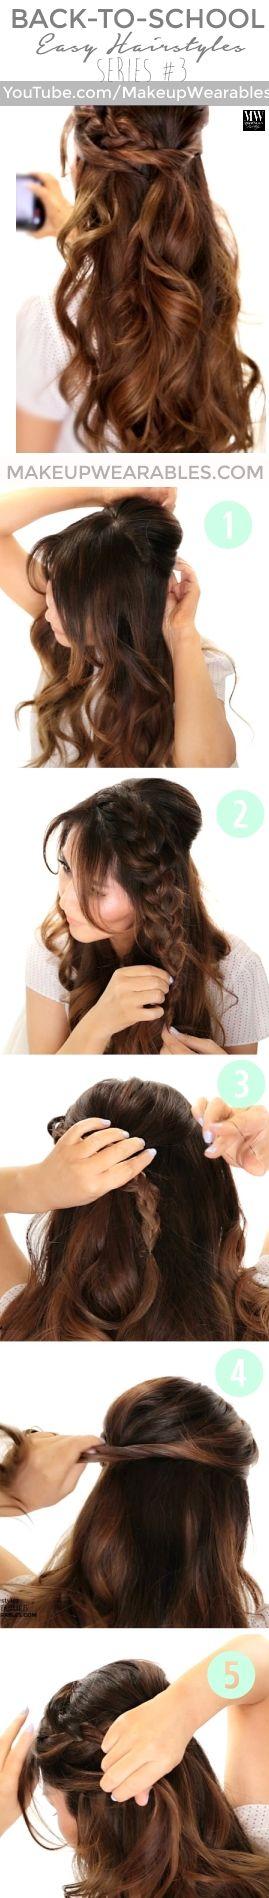 3 Totally Easy Back-to-School #Hairstyles | Cute #Hair Tutorial | #style #styles #fashion #braids #braided #braid #bts #backtoschool #easyhairstyles #updos #updo #halfup #longhair